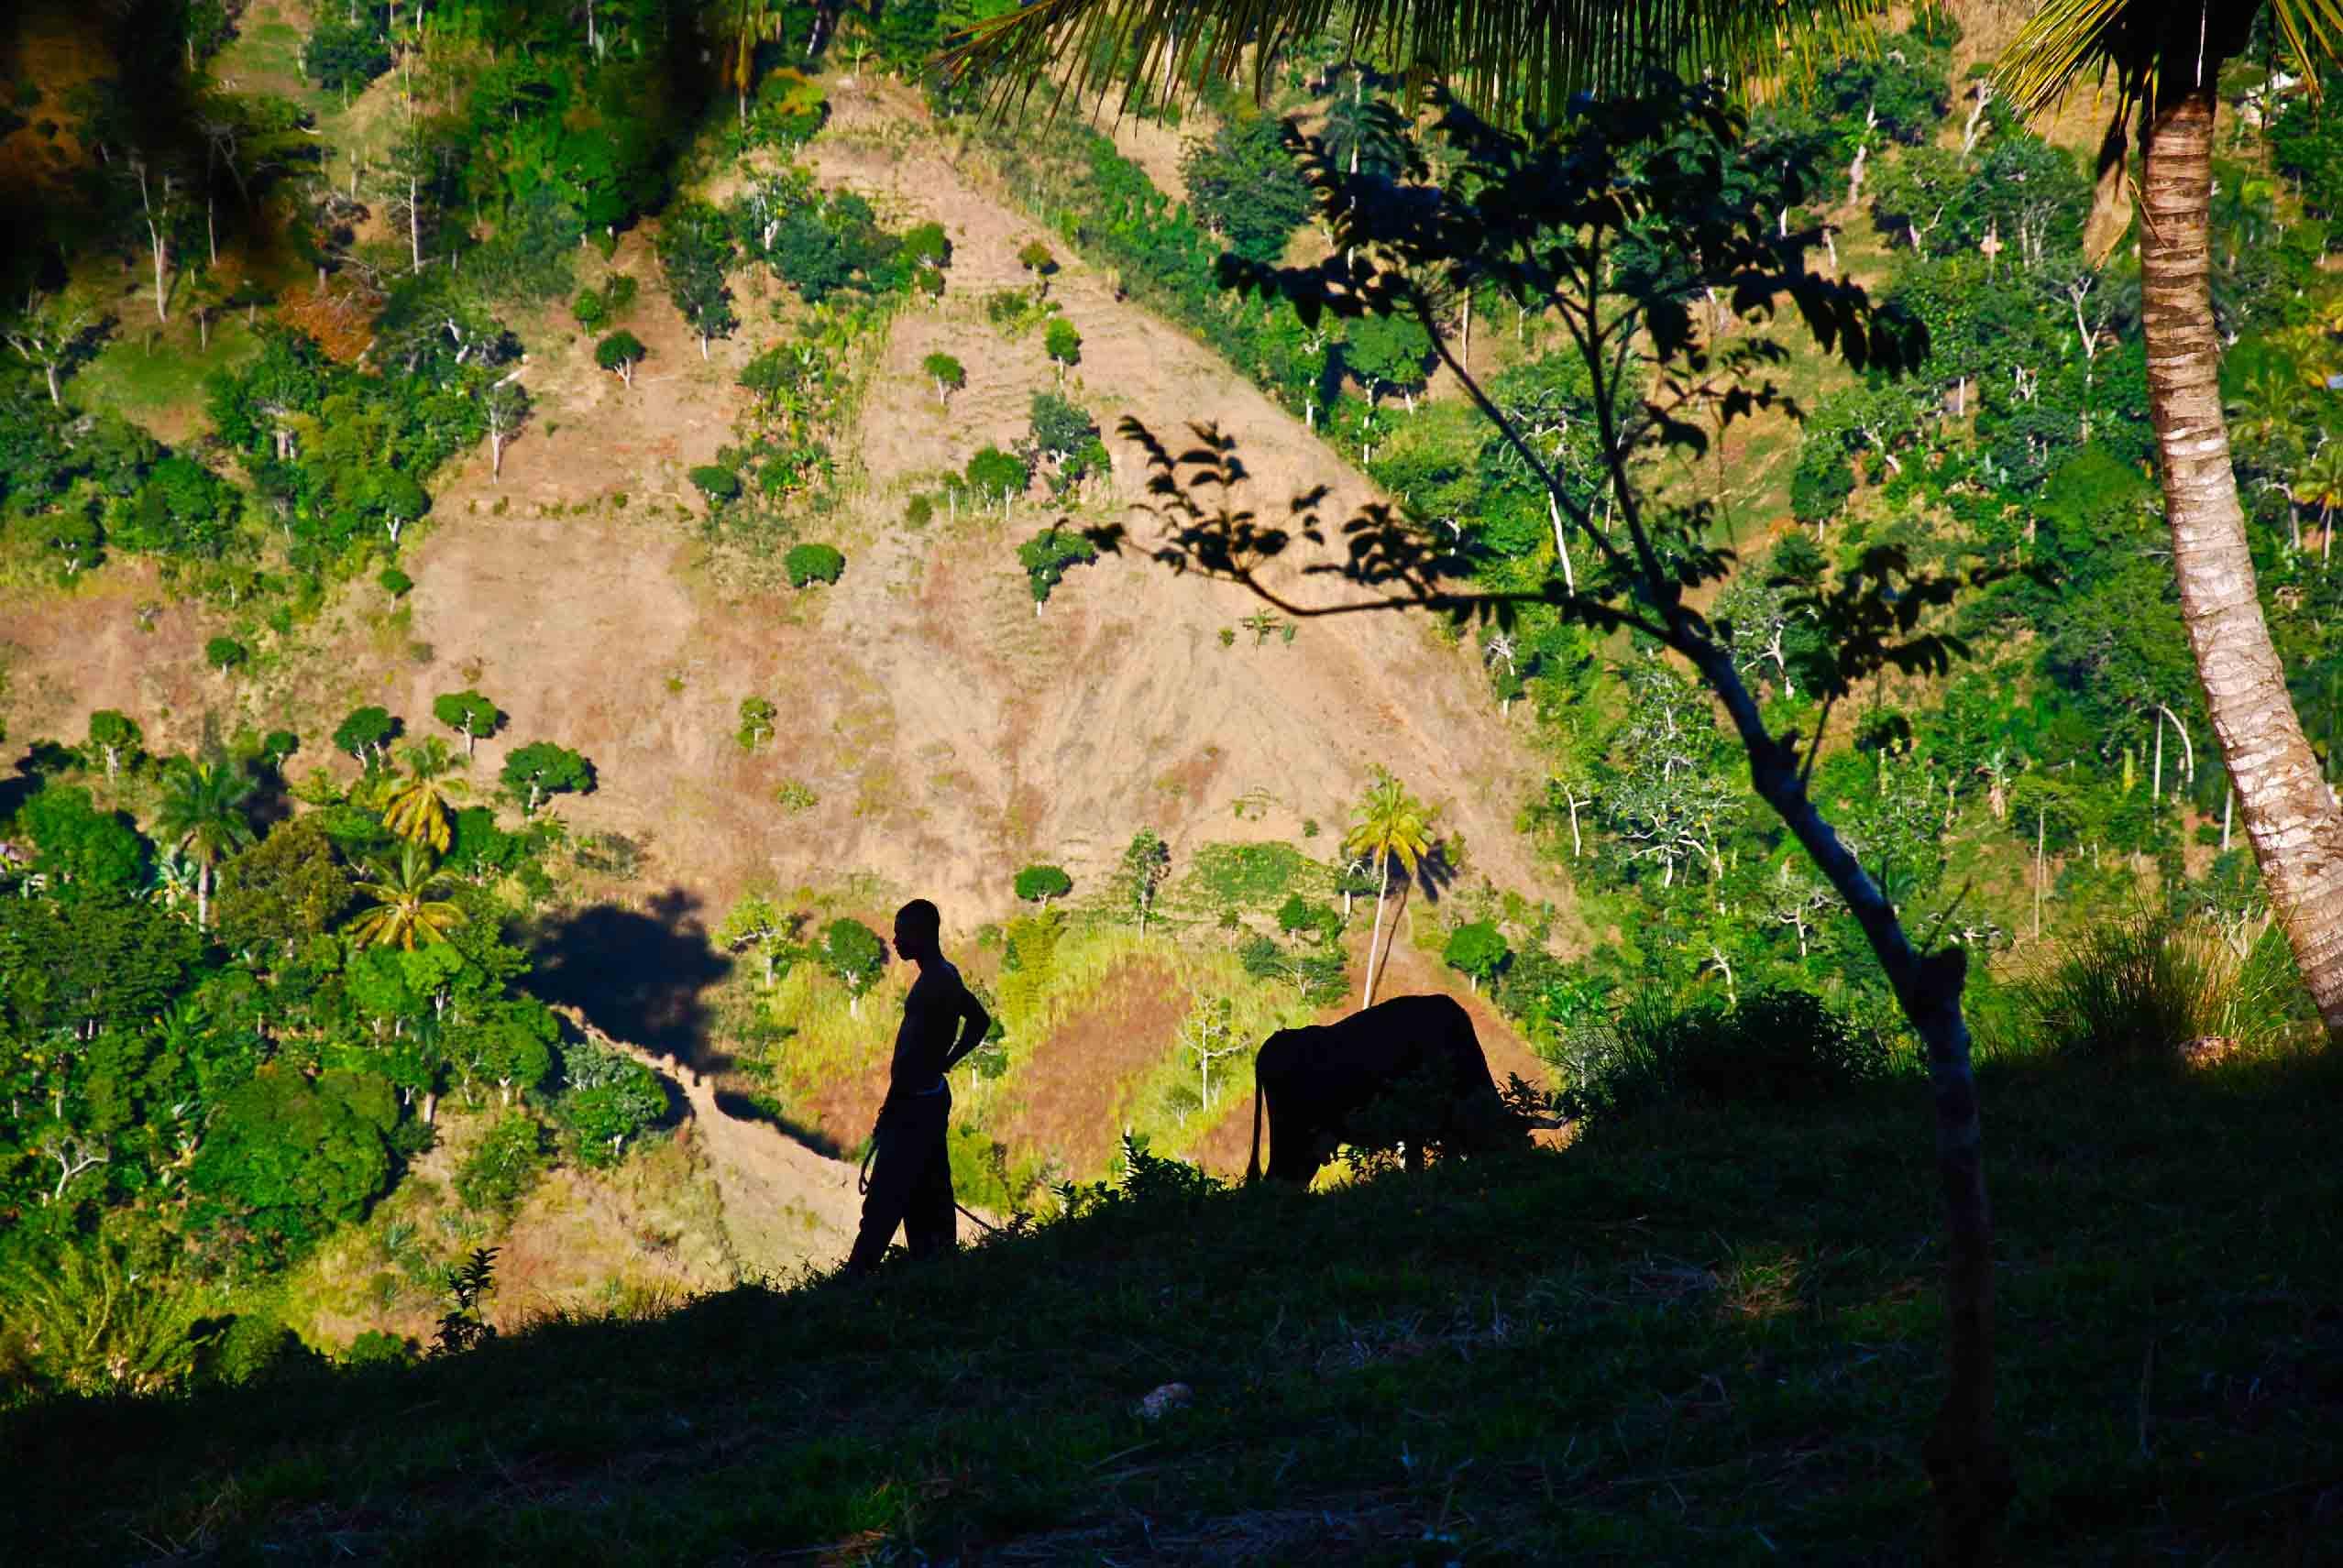 Morne érodé, paysan gardant son troupeau, Haïti. E. Malézieux, © Cirad.